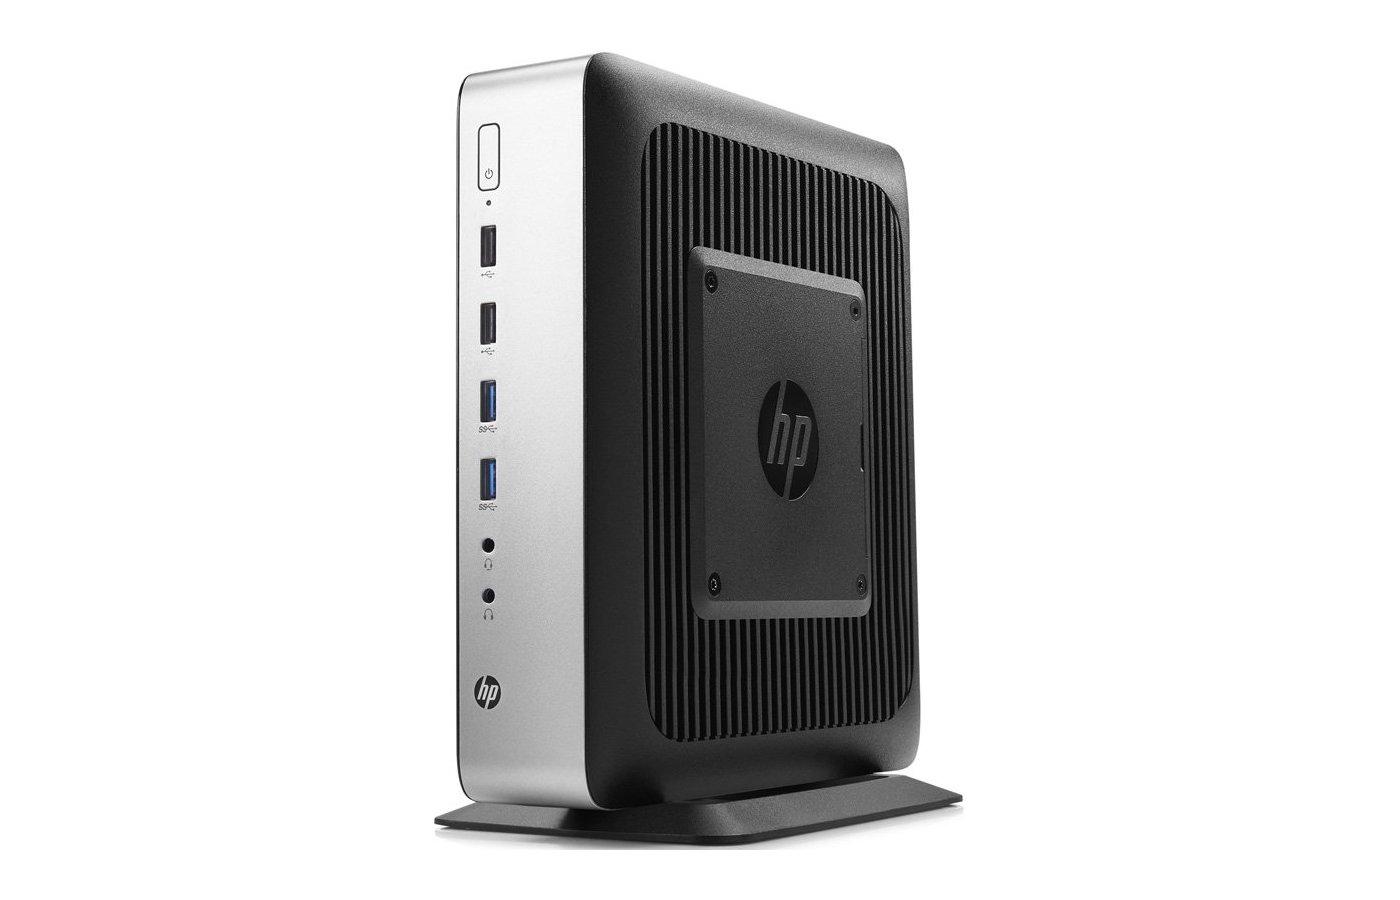 Системный блок HP t730 /P3S24AA/